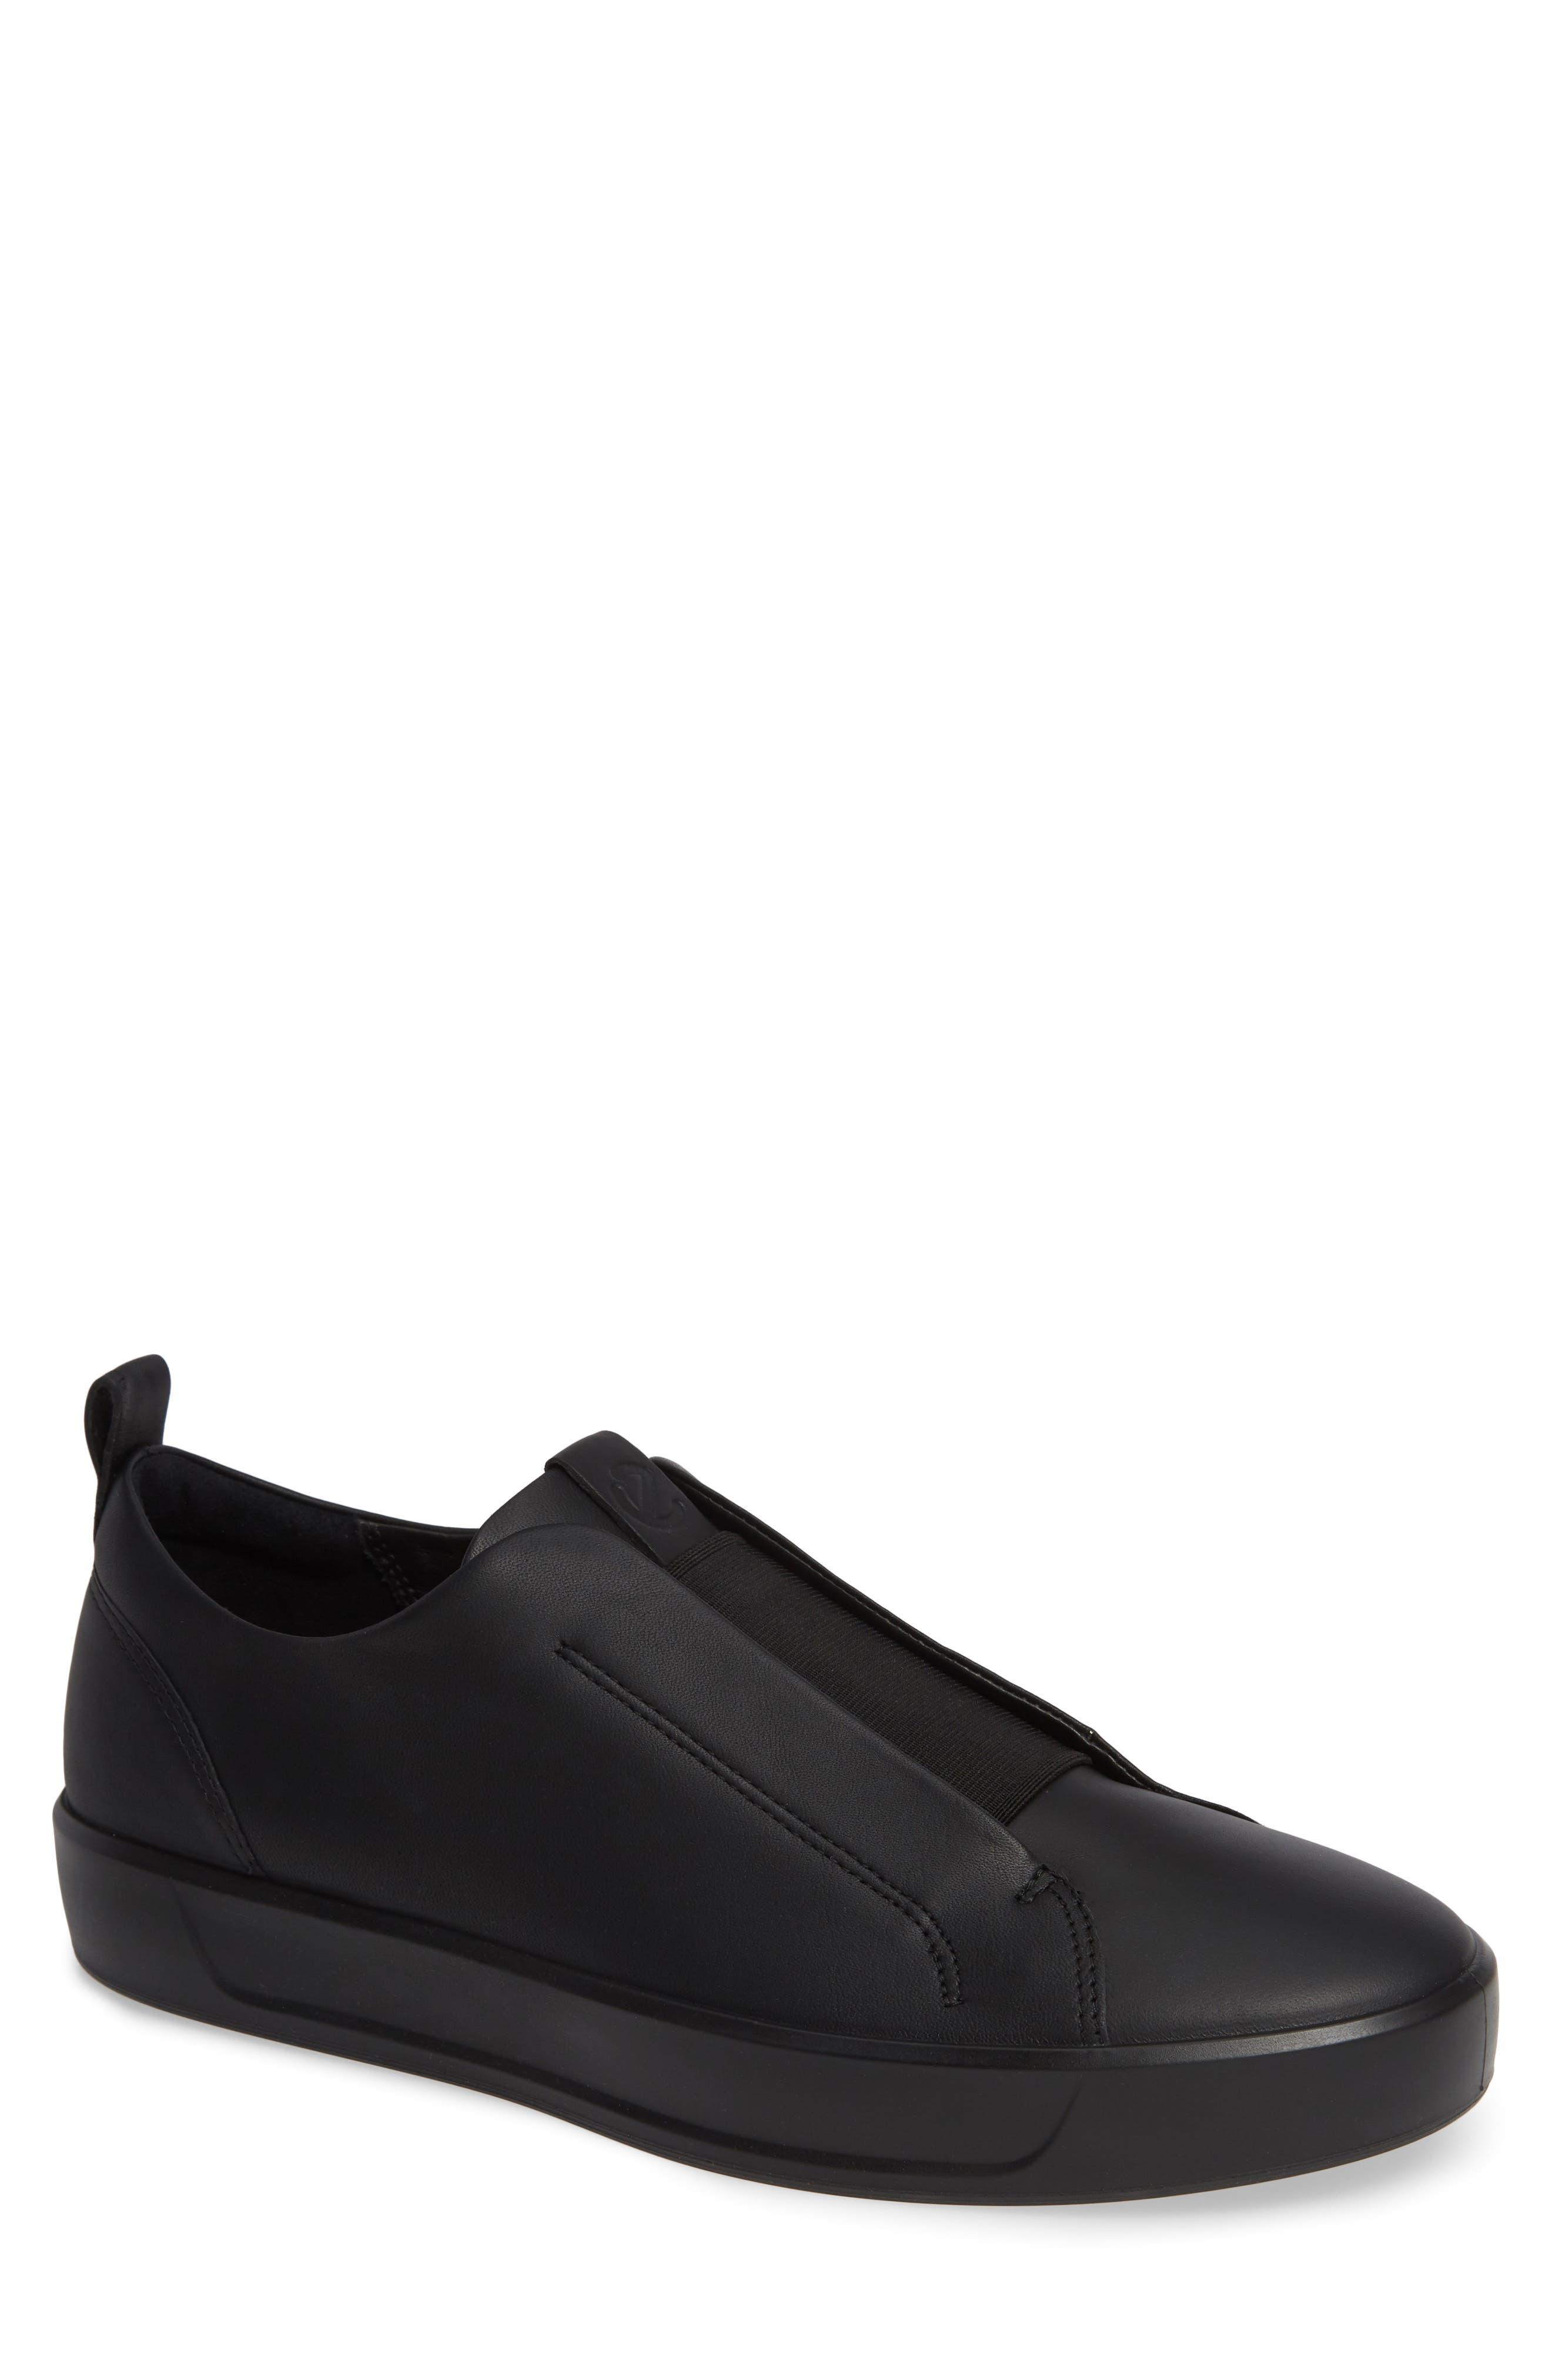 Soft 8 Slip-On Sneaker,                         Main,                         color, BLACK/ BLACK LEATHER